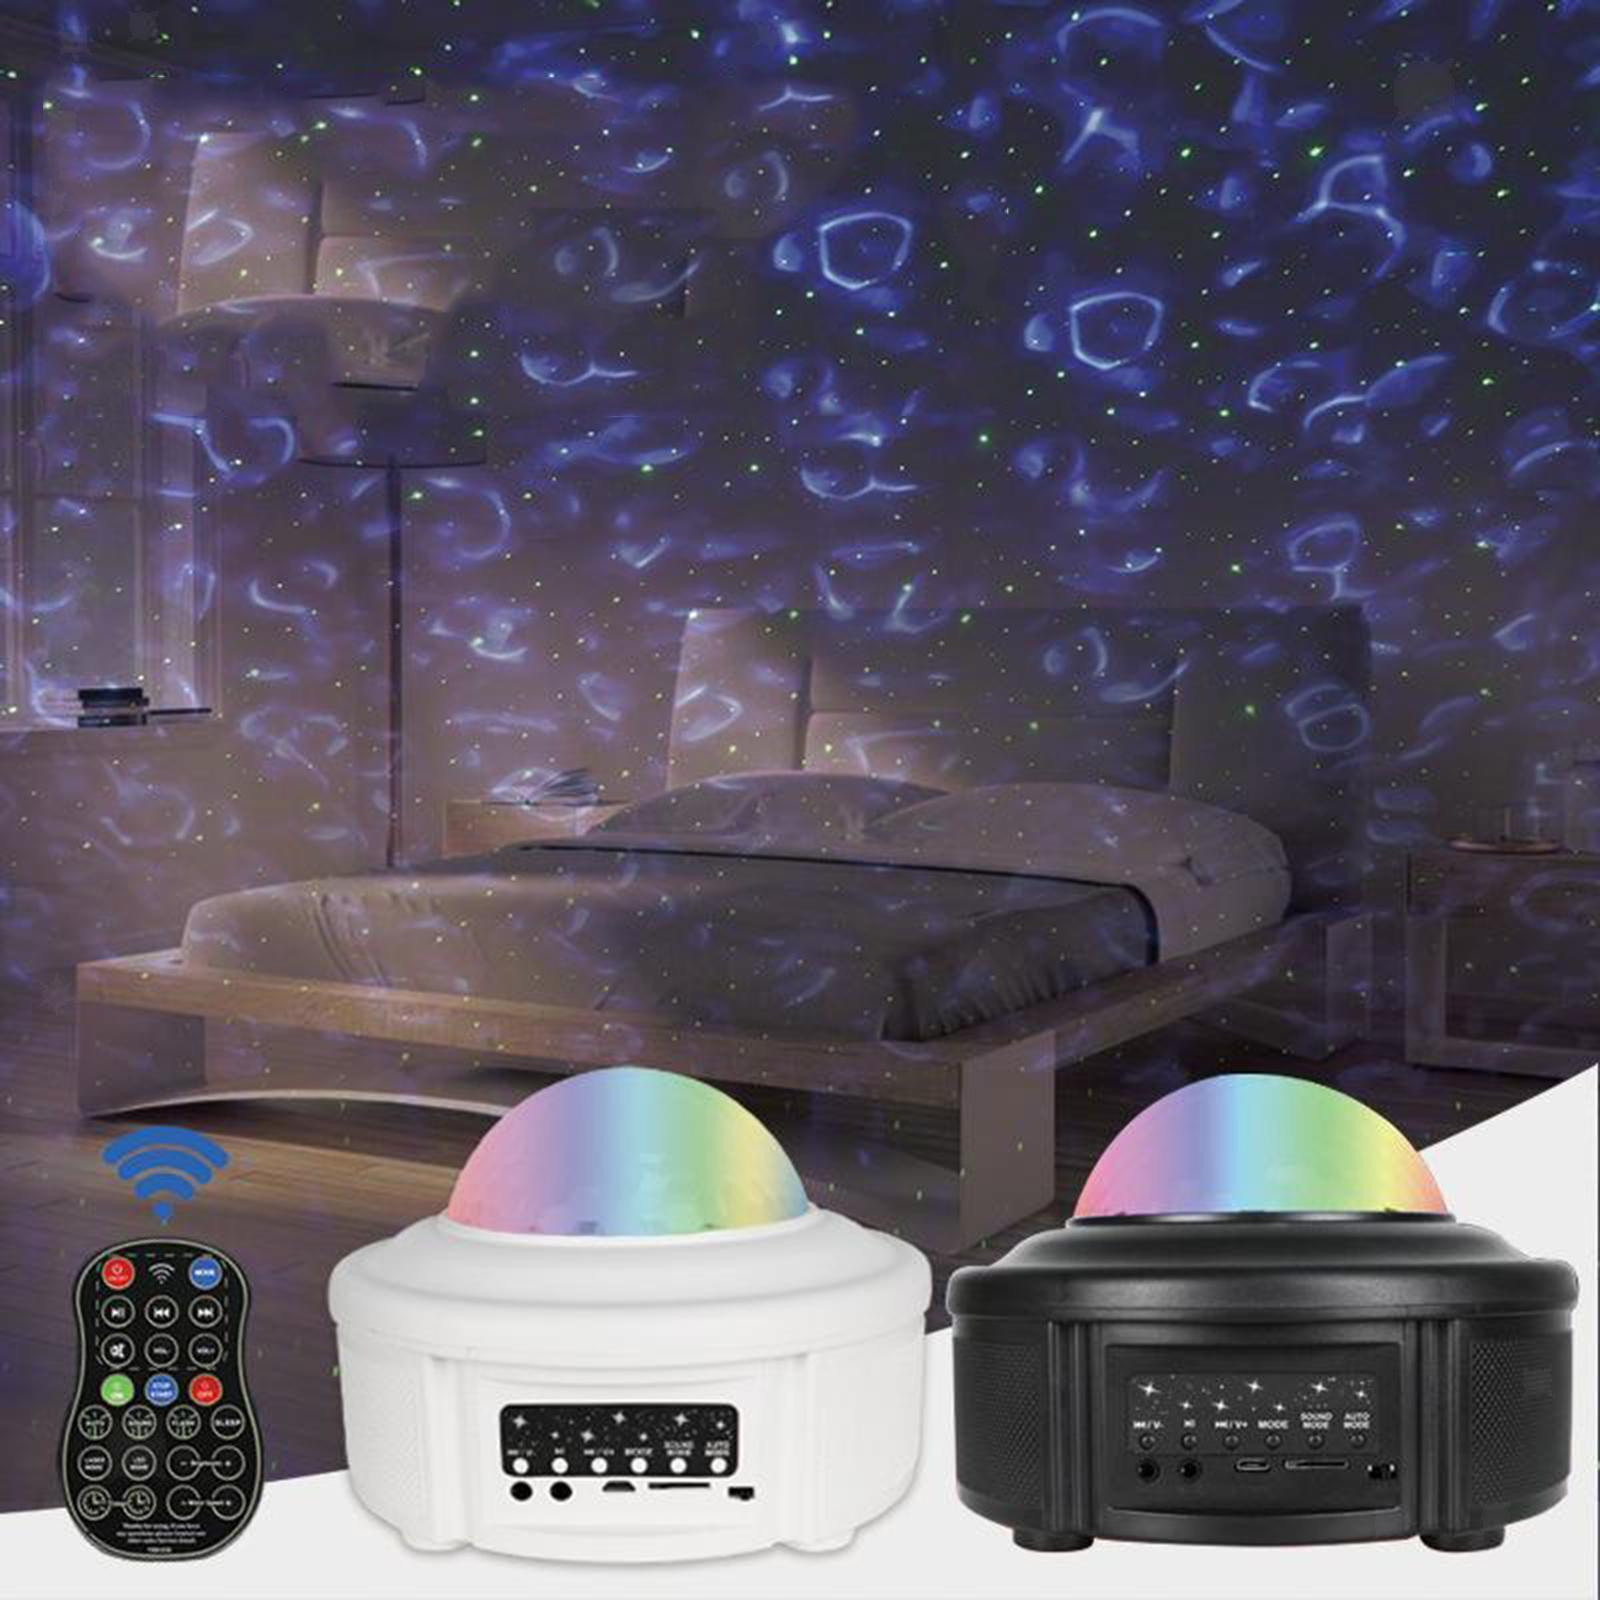 miniatura 7 - Bluetooth-LED-Galaxy-Proiettore-Lampada-notturna-stellata-Luce-notturna-a